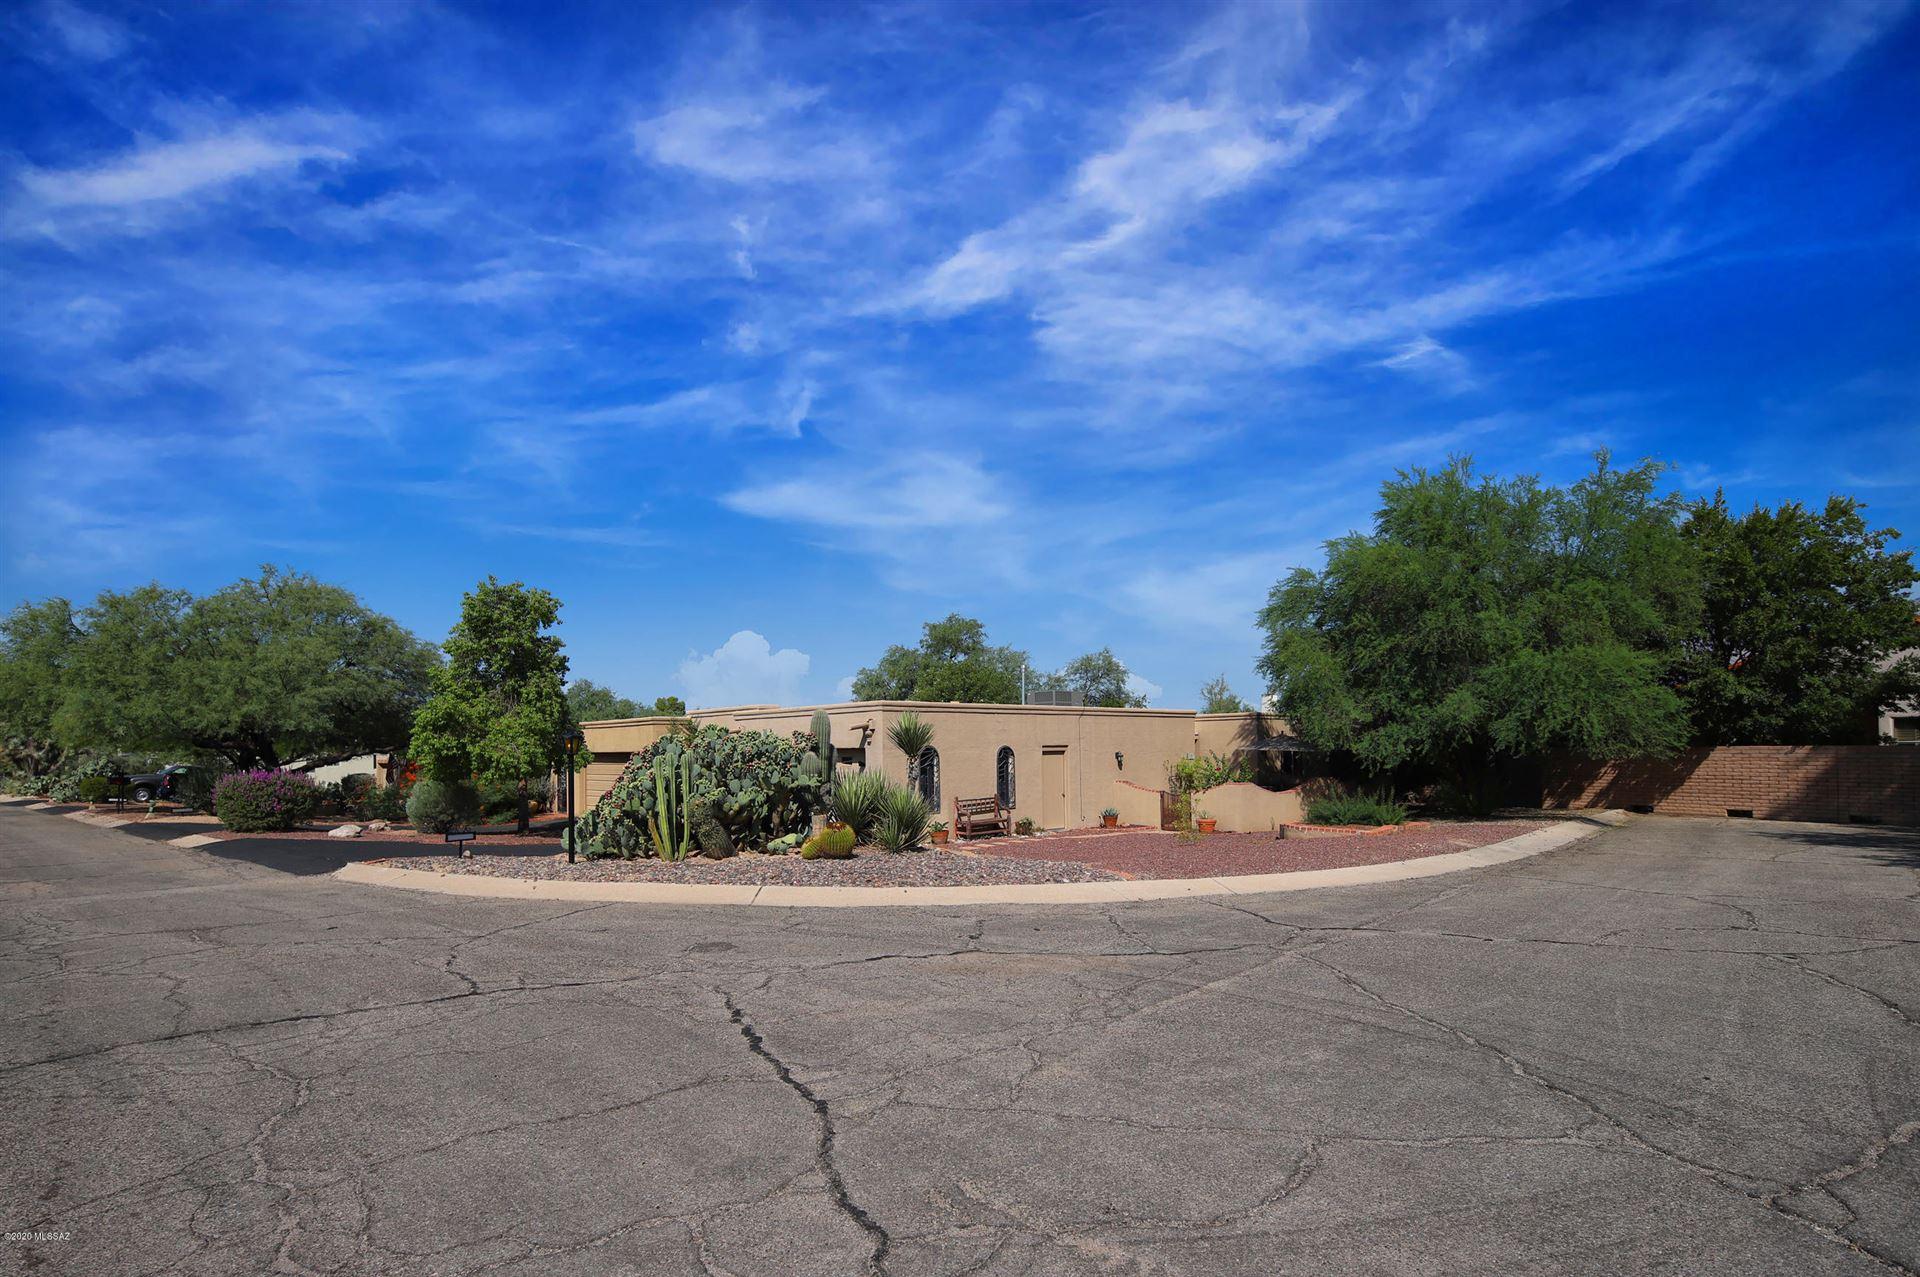 7227 E Camino Valle Verde, Tucson, AZ 85715 - #: 22022733